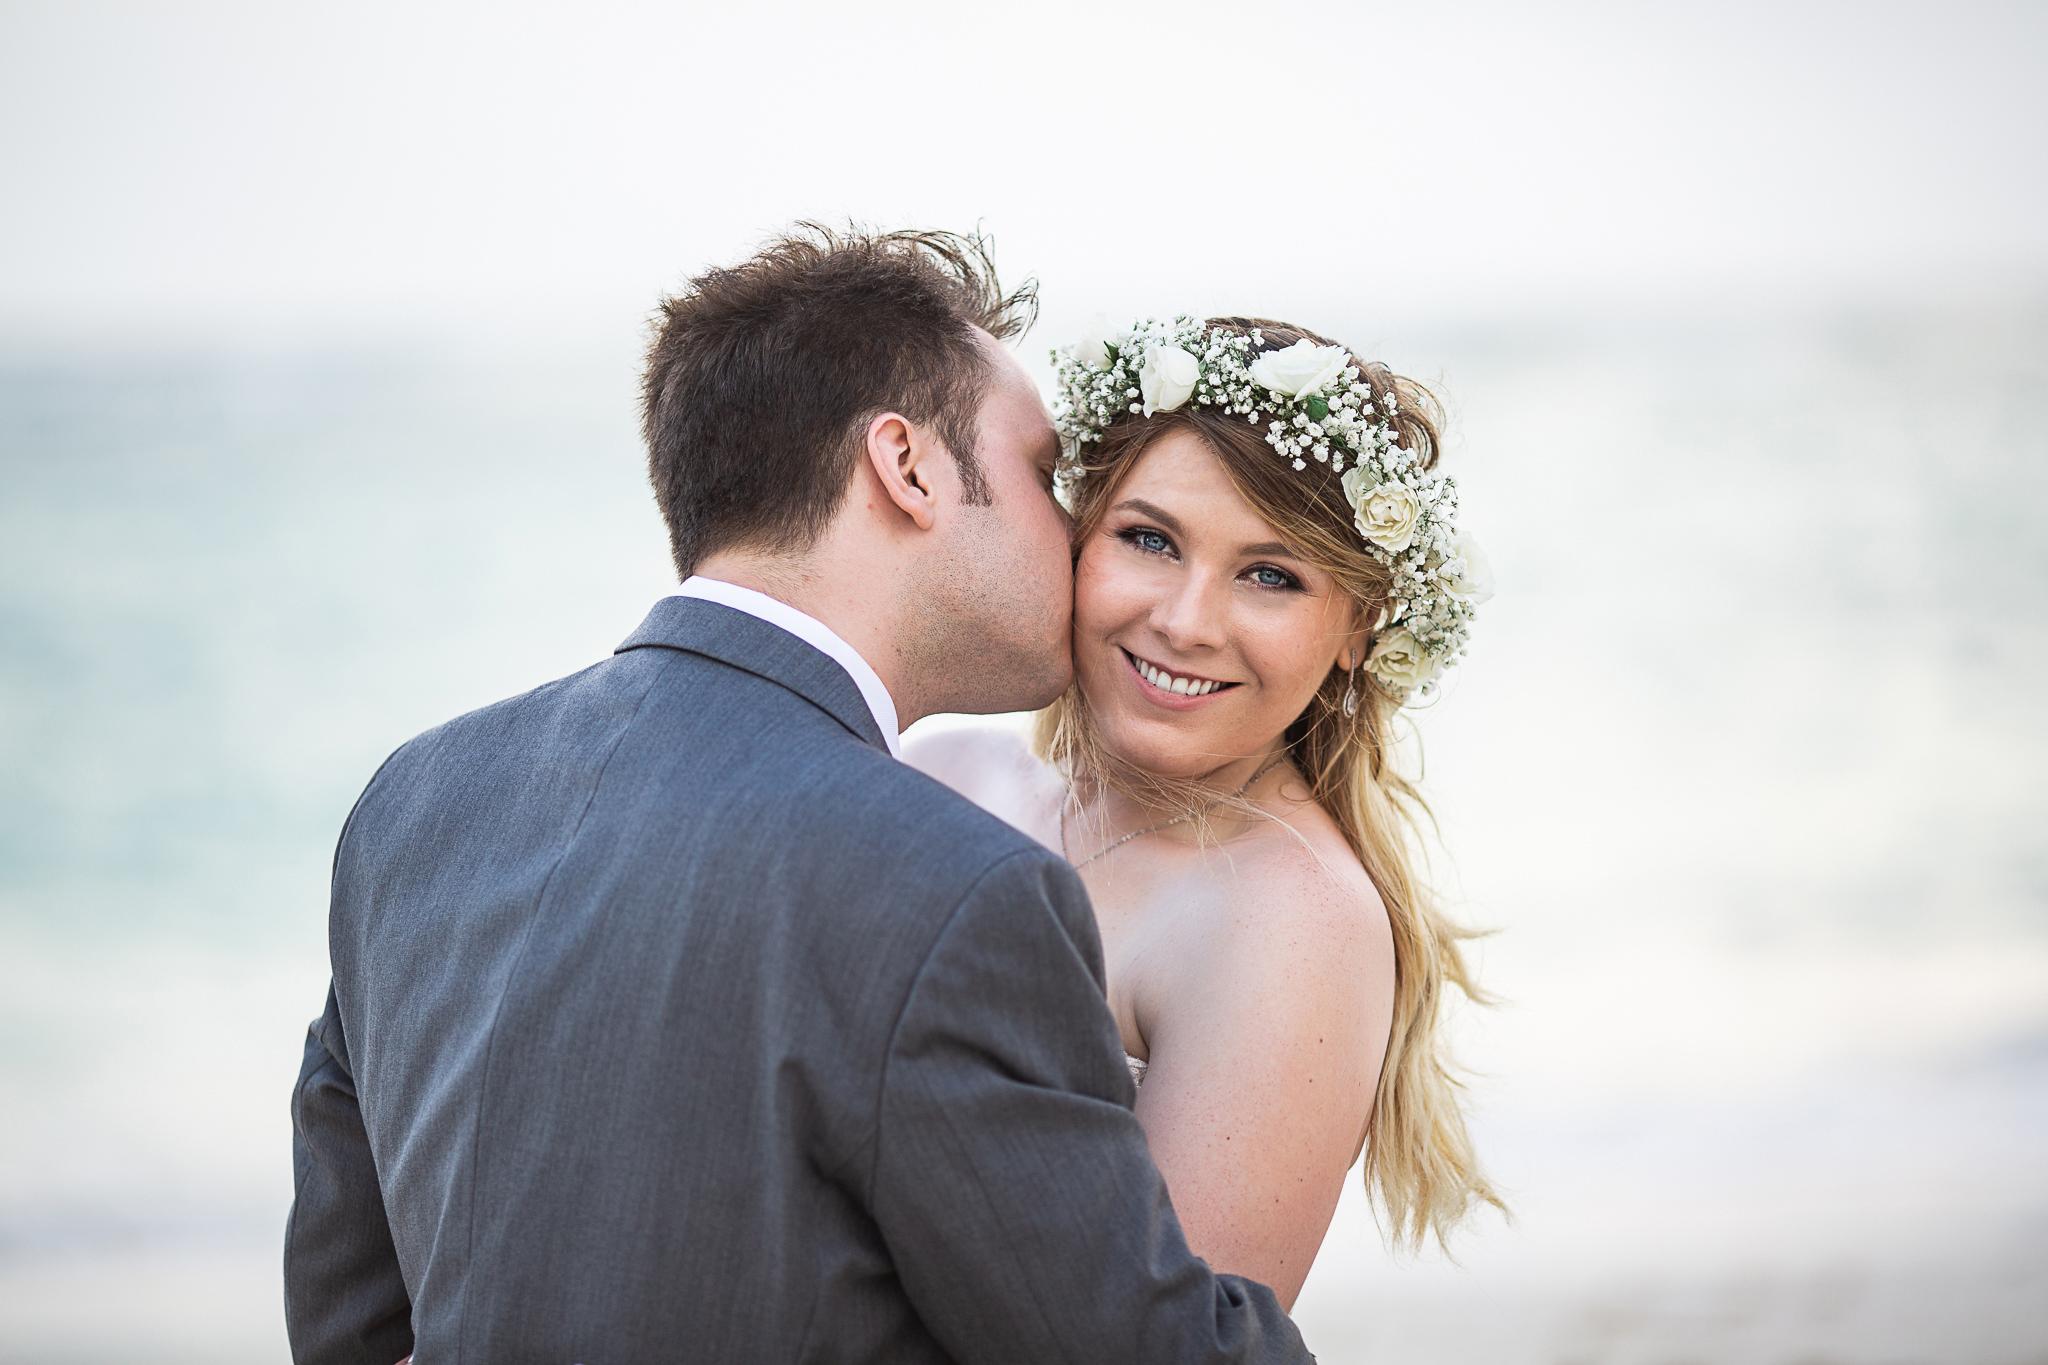 Bride and groom kissing on cheek